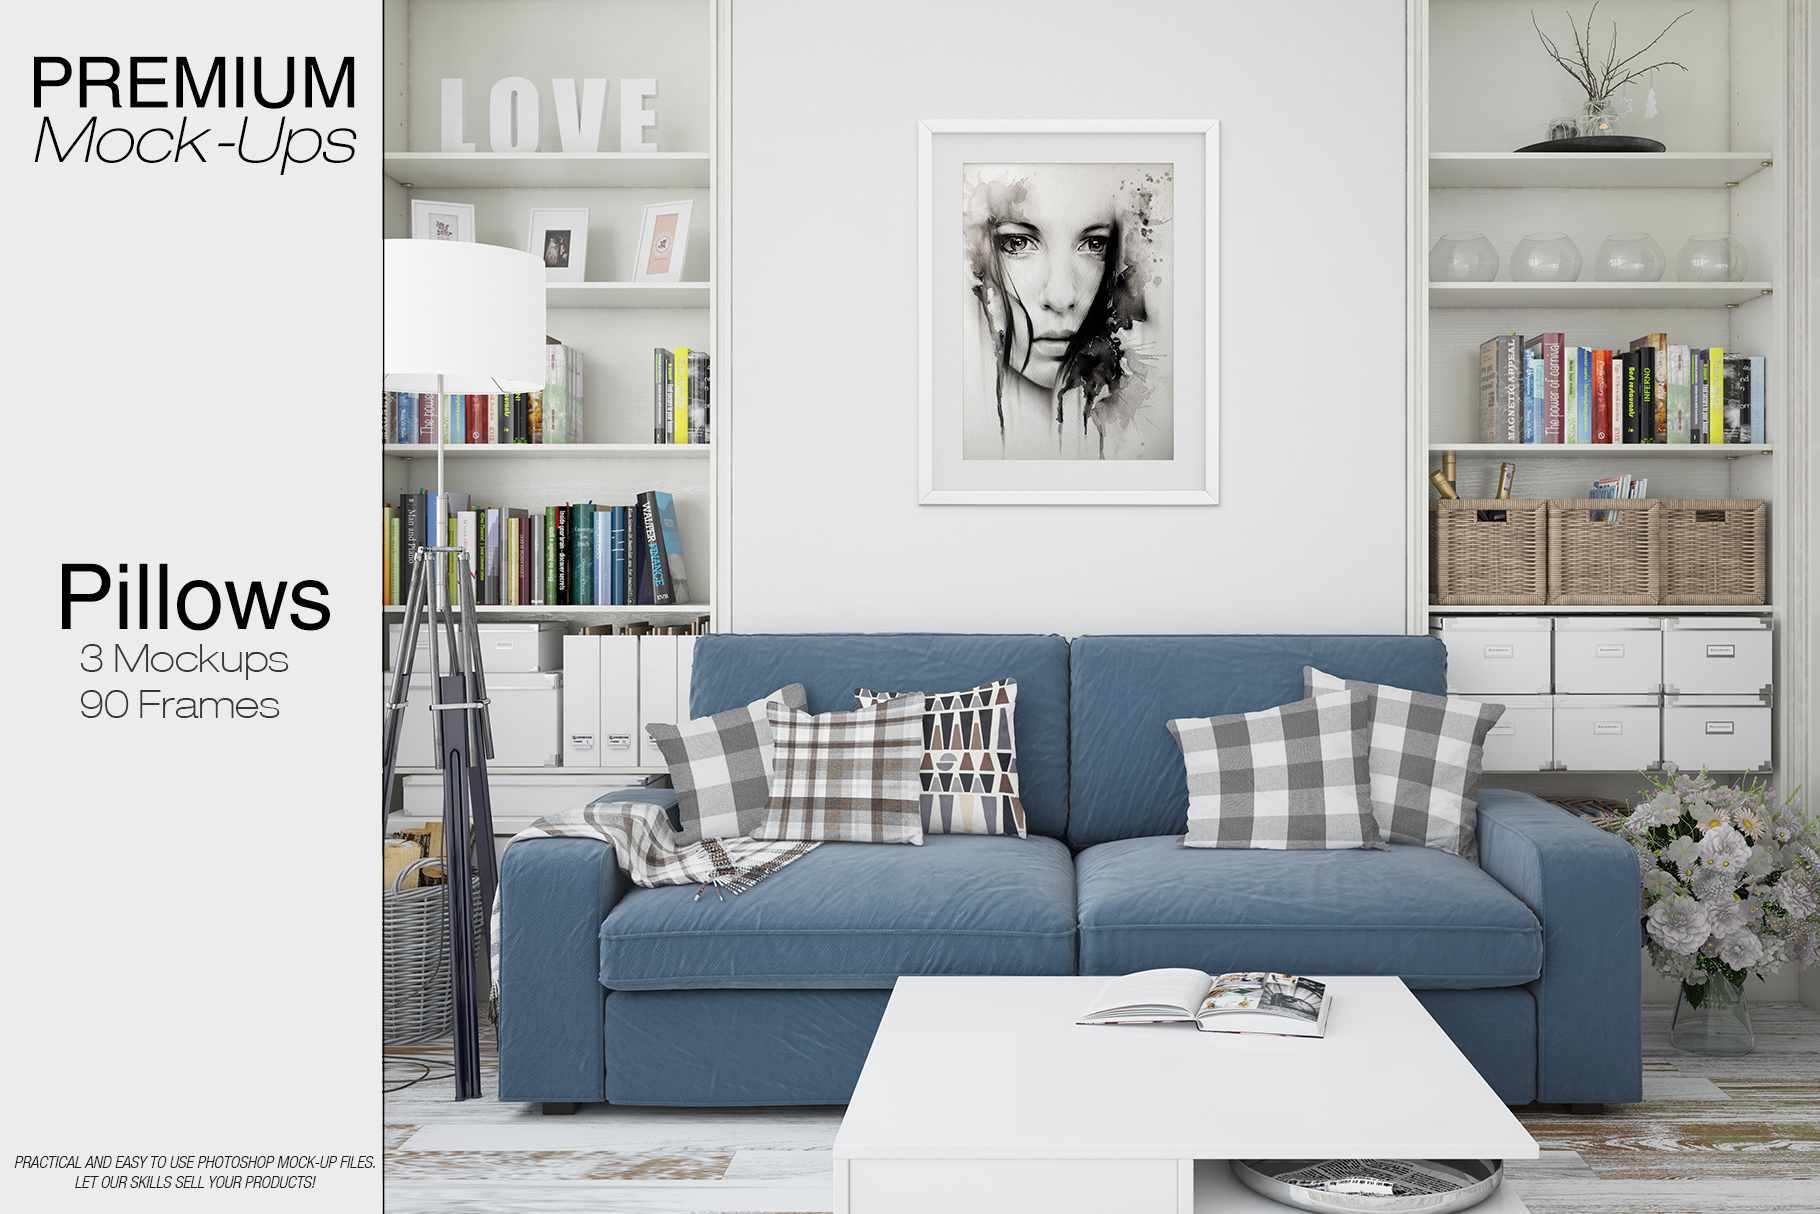 Pillows & Frames Mockup Set example image 1